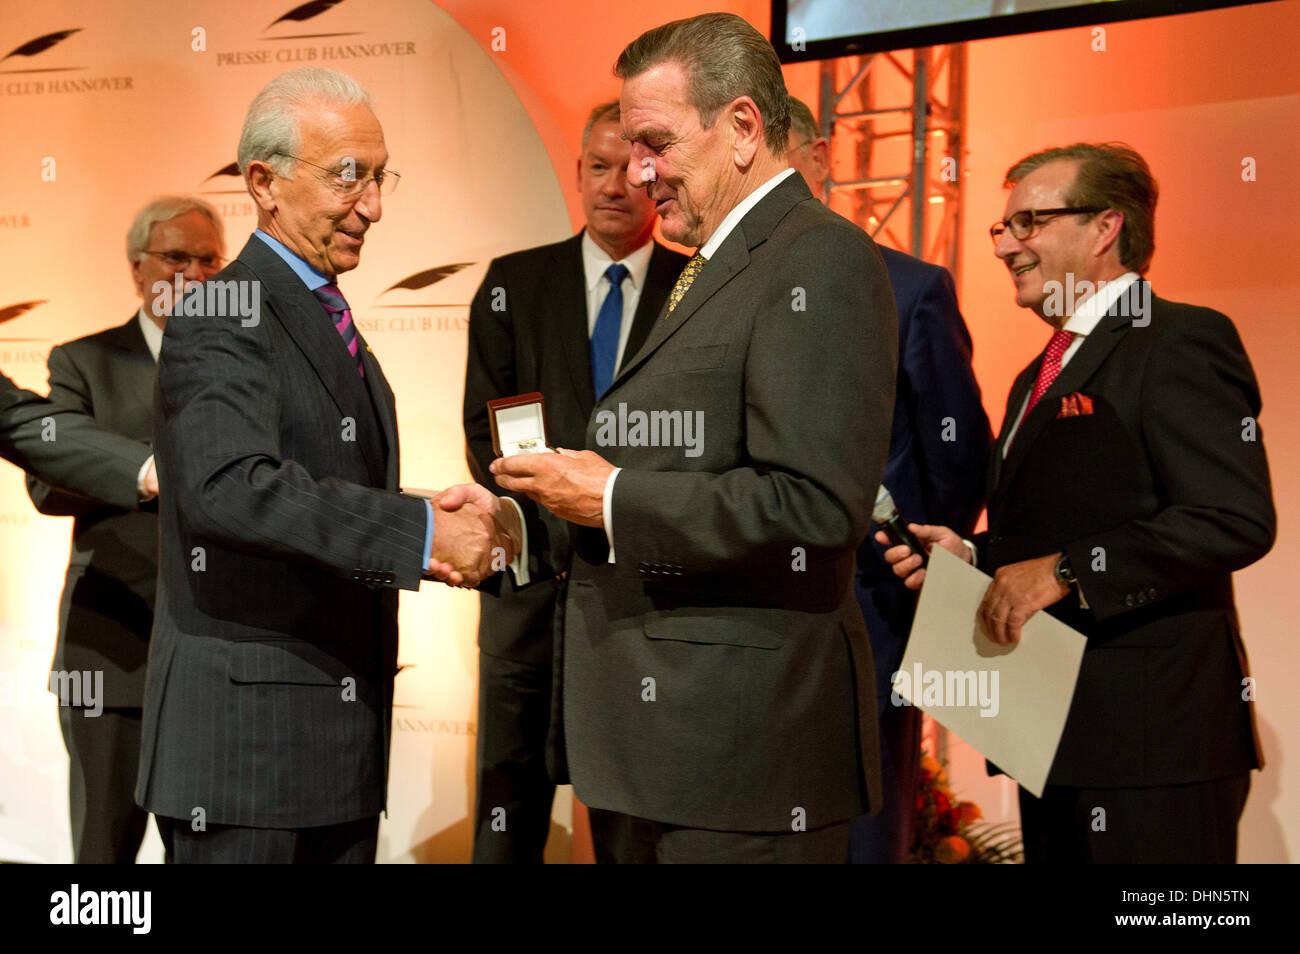 Hanover, Germany. 12th Nov, 2013. Former German Chancellor Gerhard Schroeder (SPD, 2nd R) awards brain surgeon Madjid Stock Photo